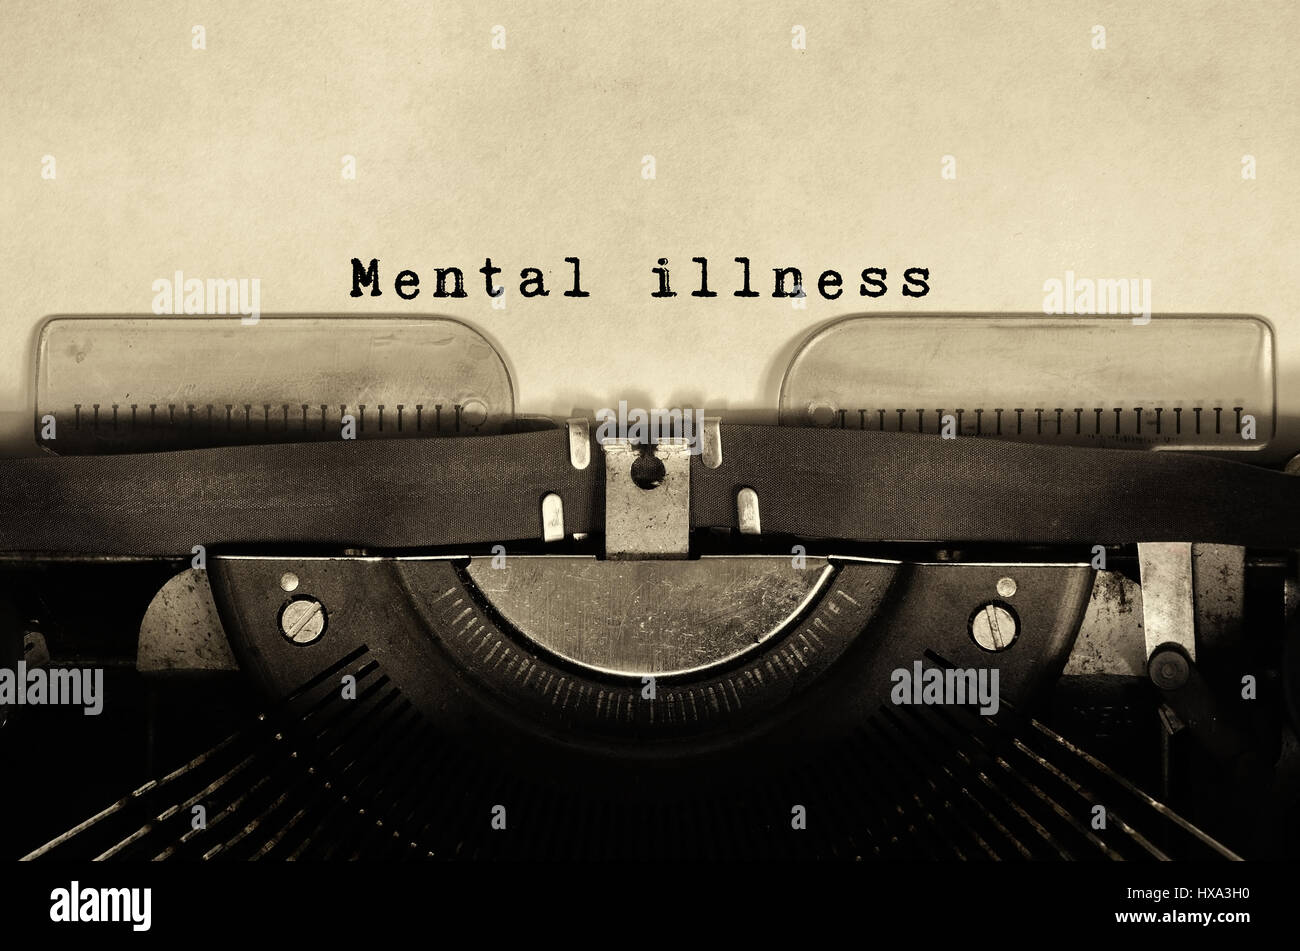 Mental illness typed on vintage typewriter - Stock Image